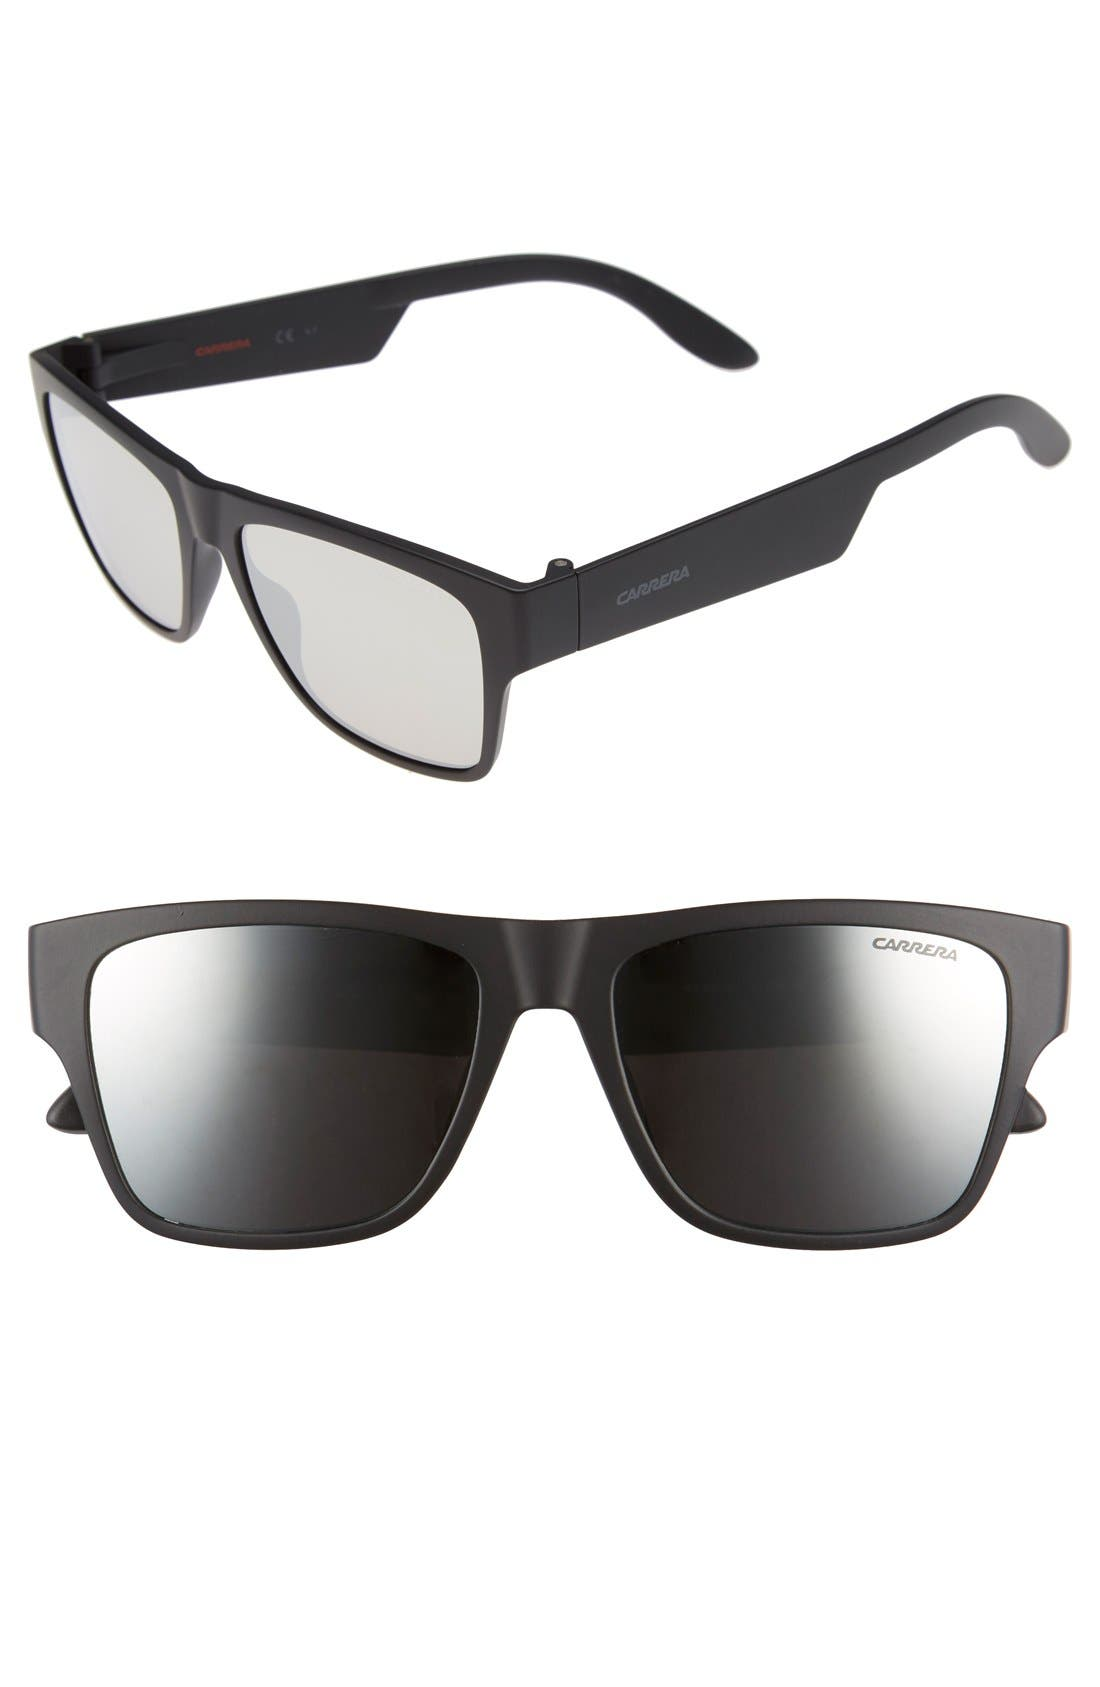 55mm Retro Sunglasses,                             Main thumbnail 1, color,                             MATTE BLACK/ BLACK